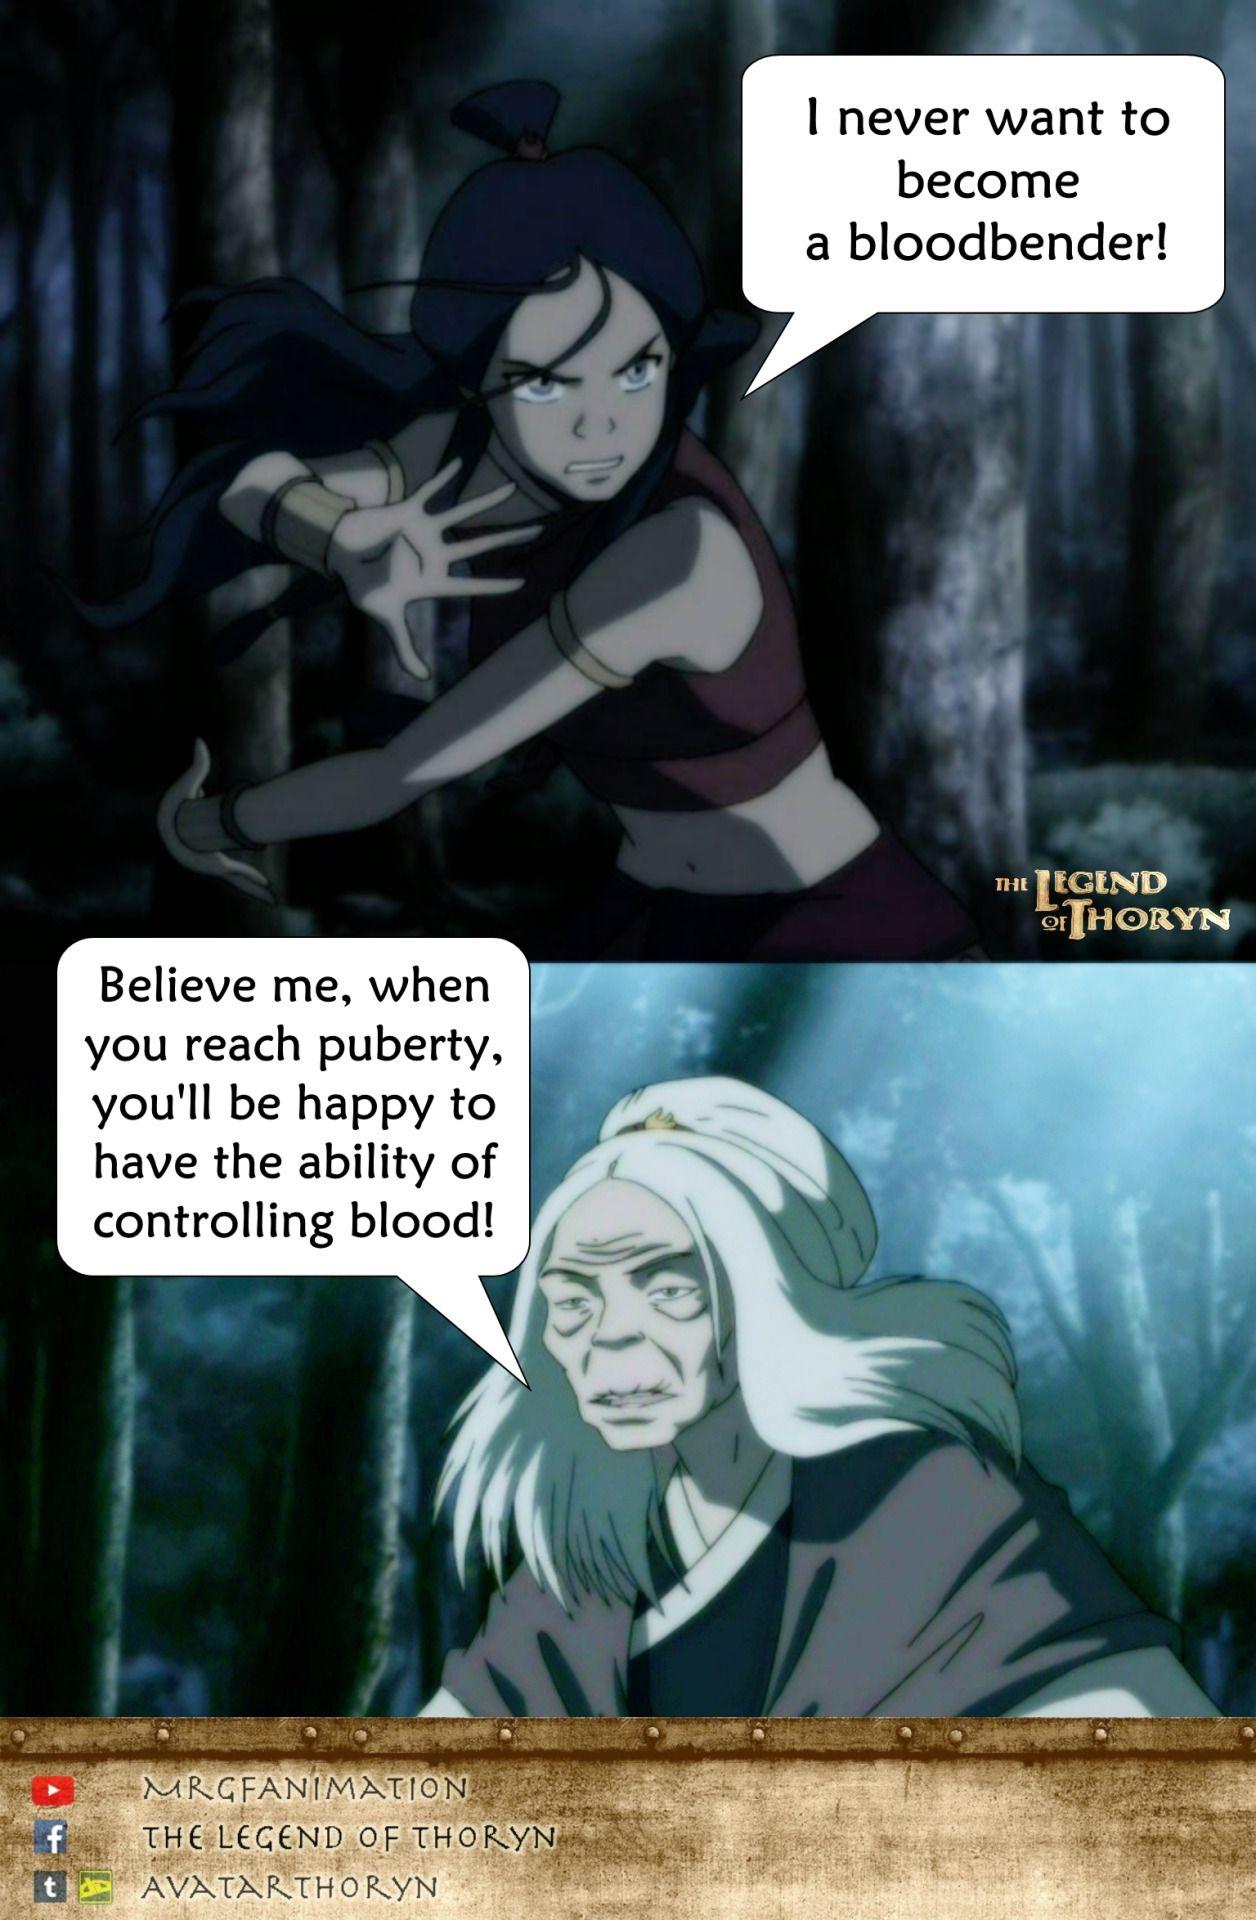 Bloodbender Hahaha Avatar The Last Airbender Avatar The Last